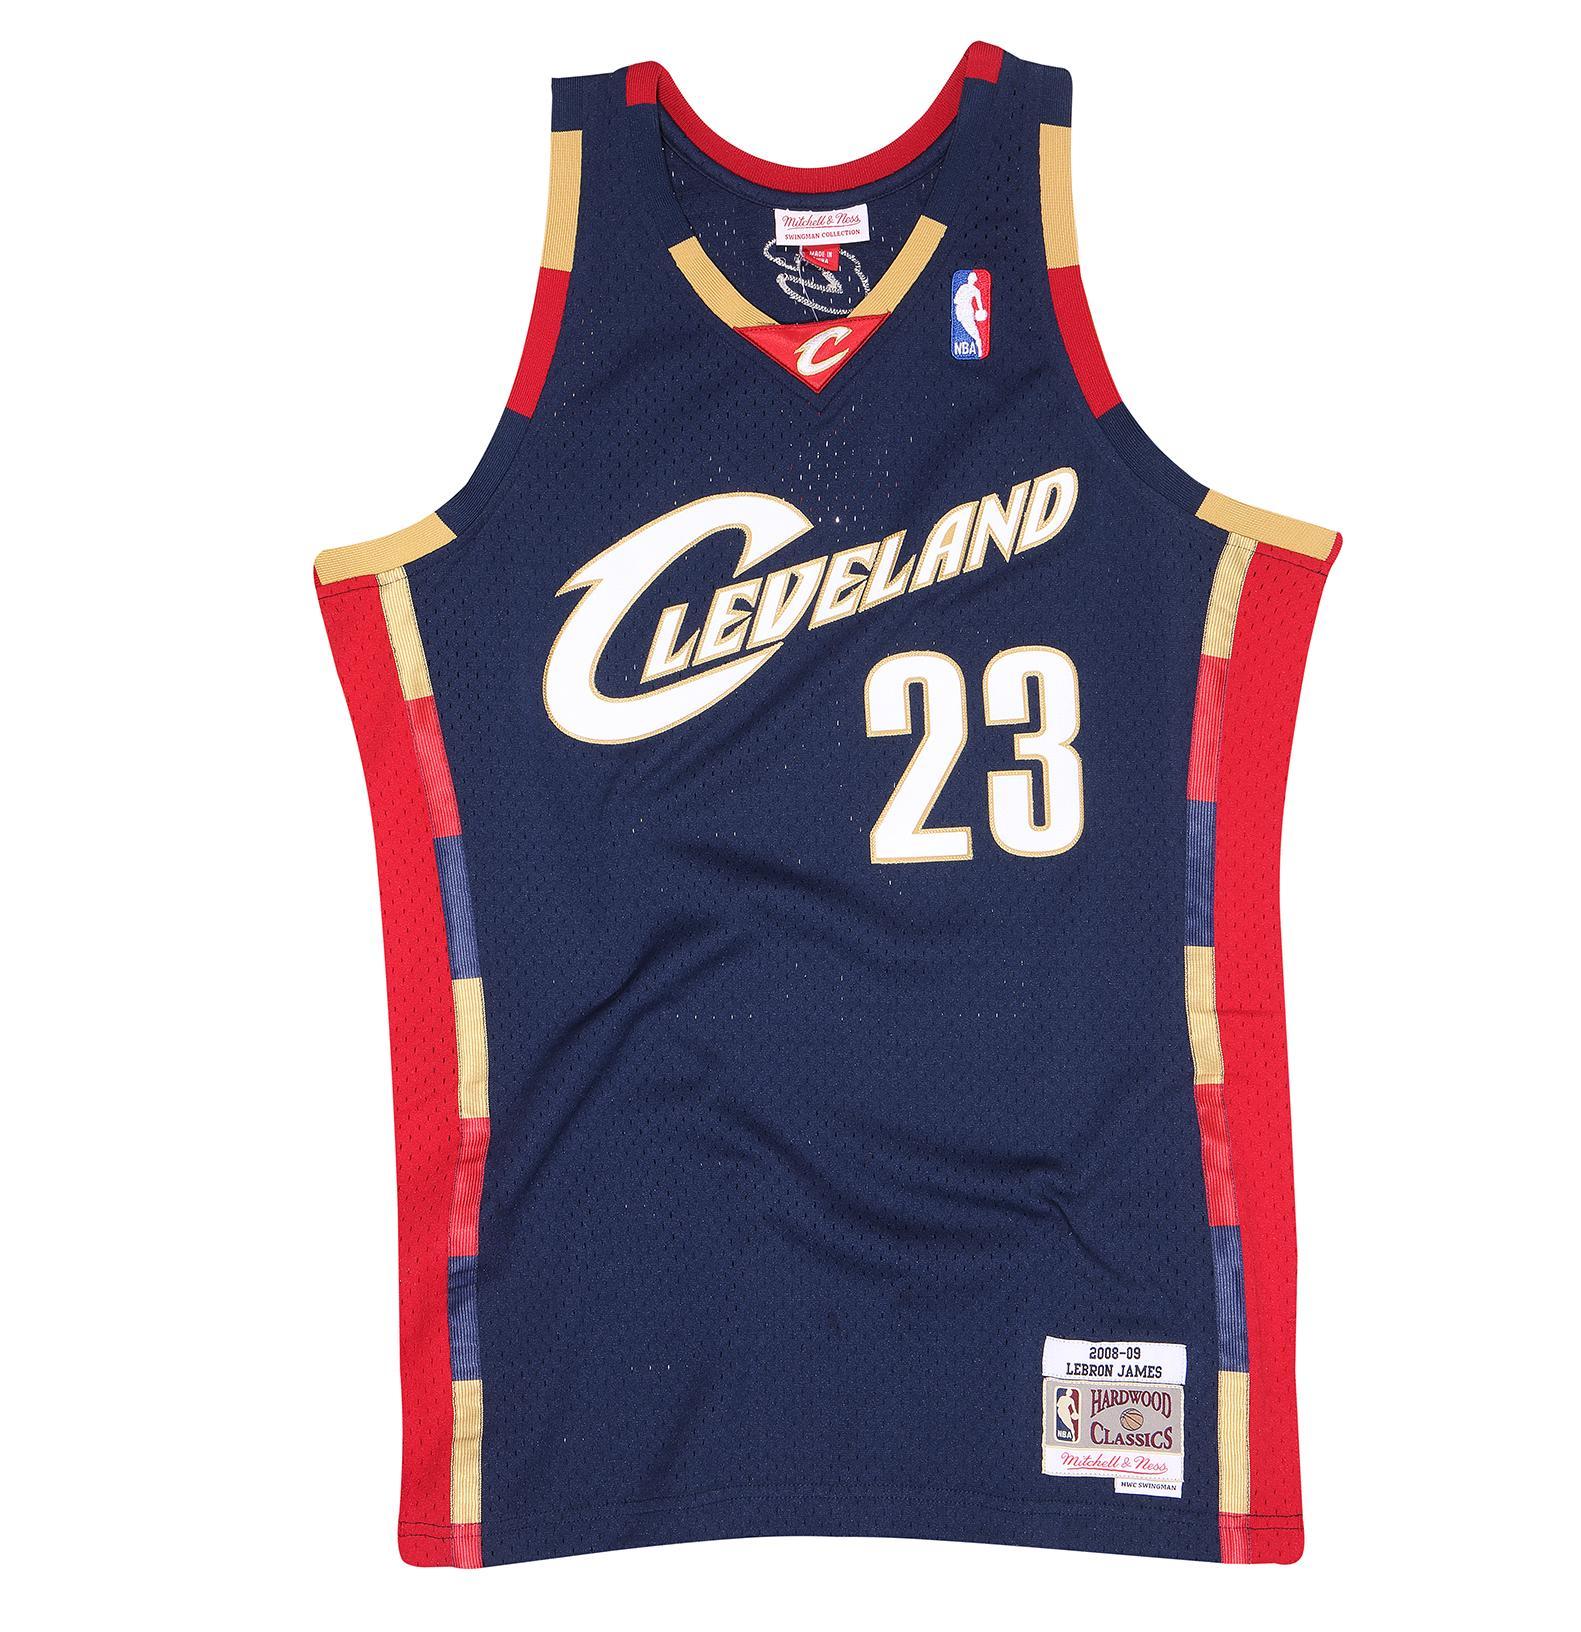 589e7dccb3e Mitchell & Ness Nostalgia Co. Lebron James Cleveland Cavaliers 2008 ...